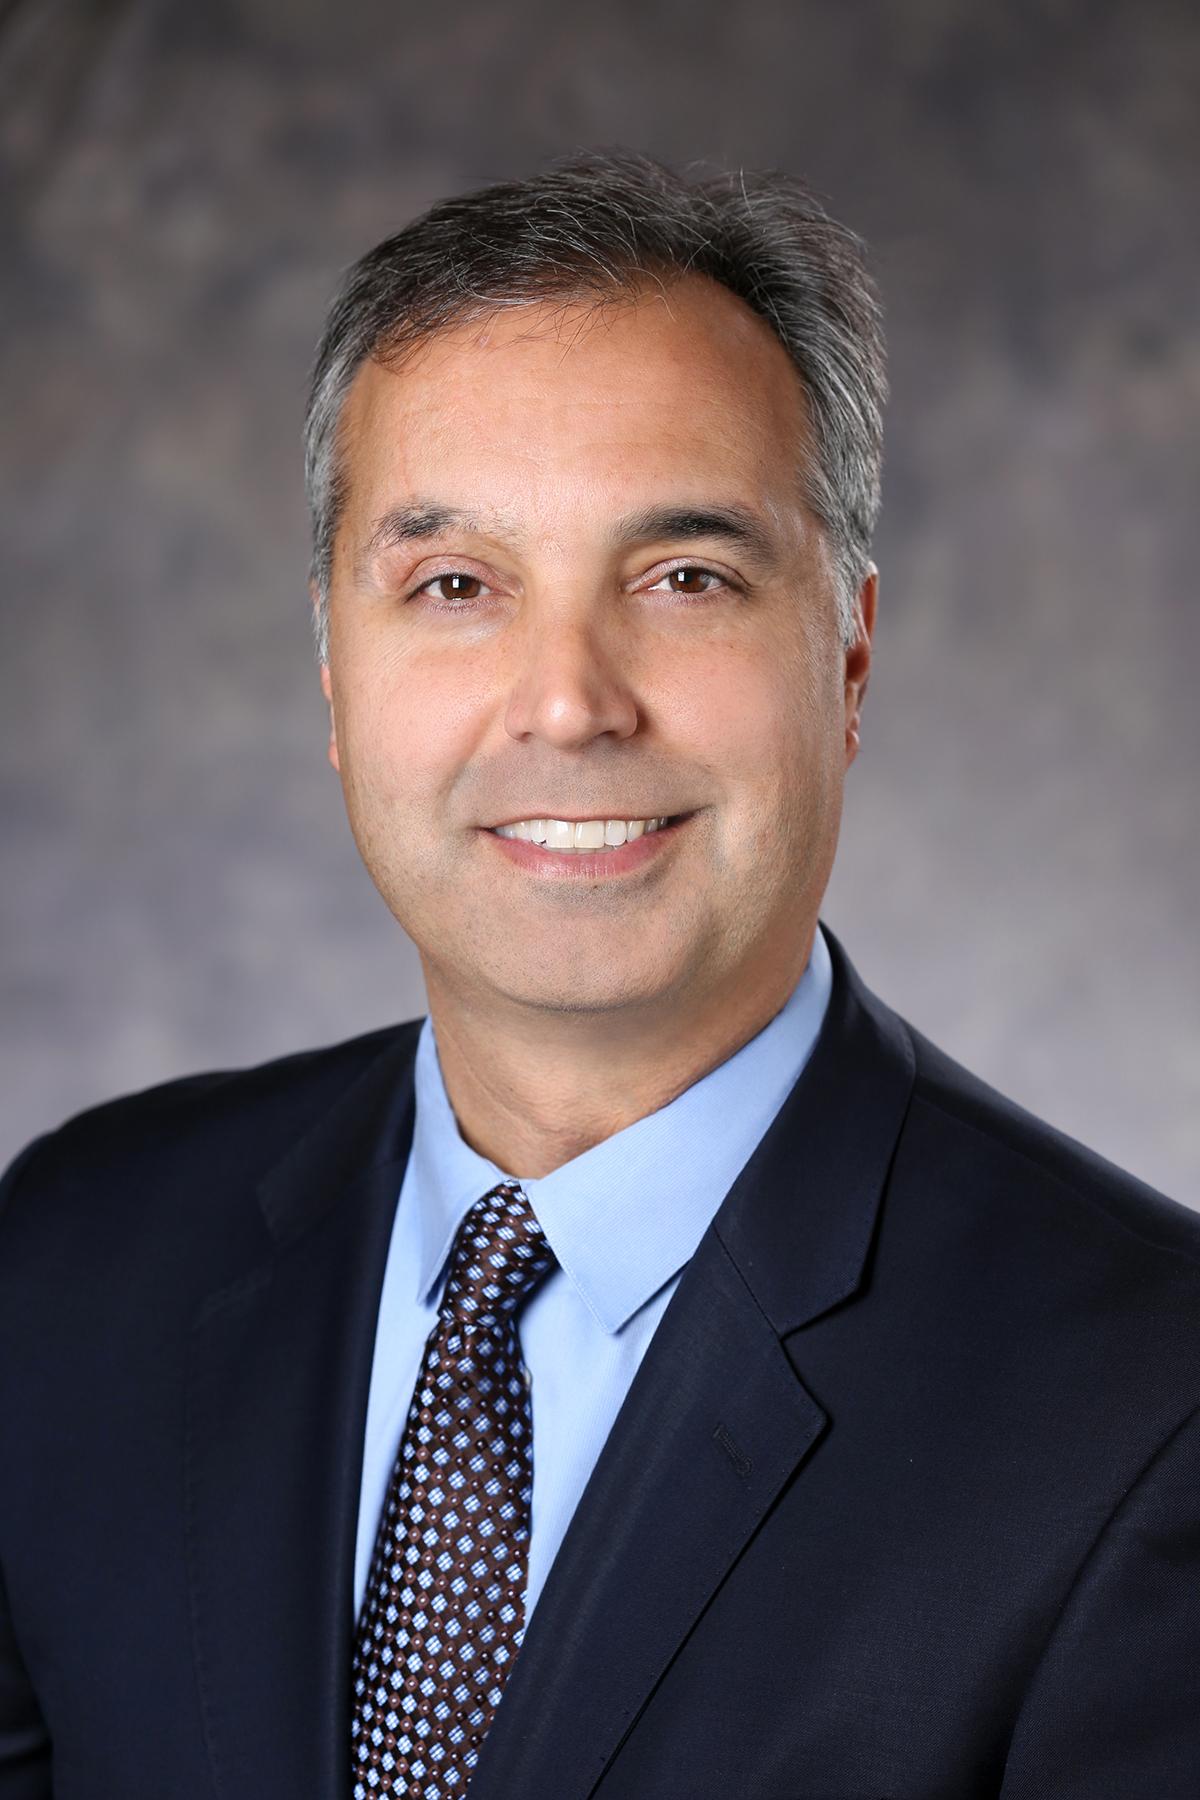 Mike Parra -Director Ejecutivo regional